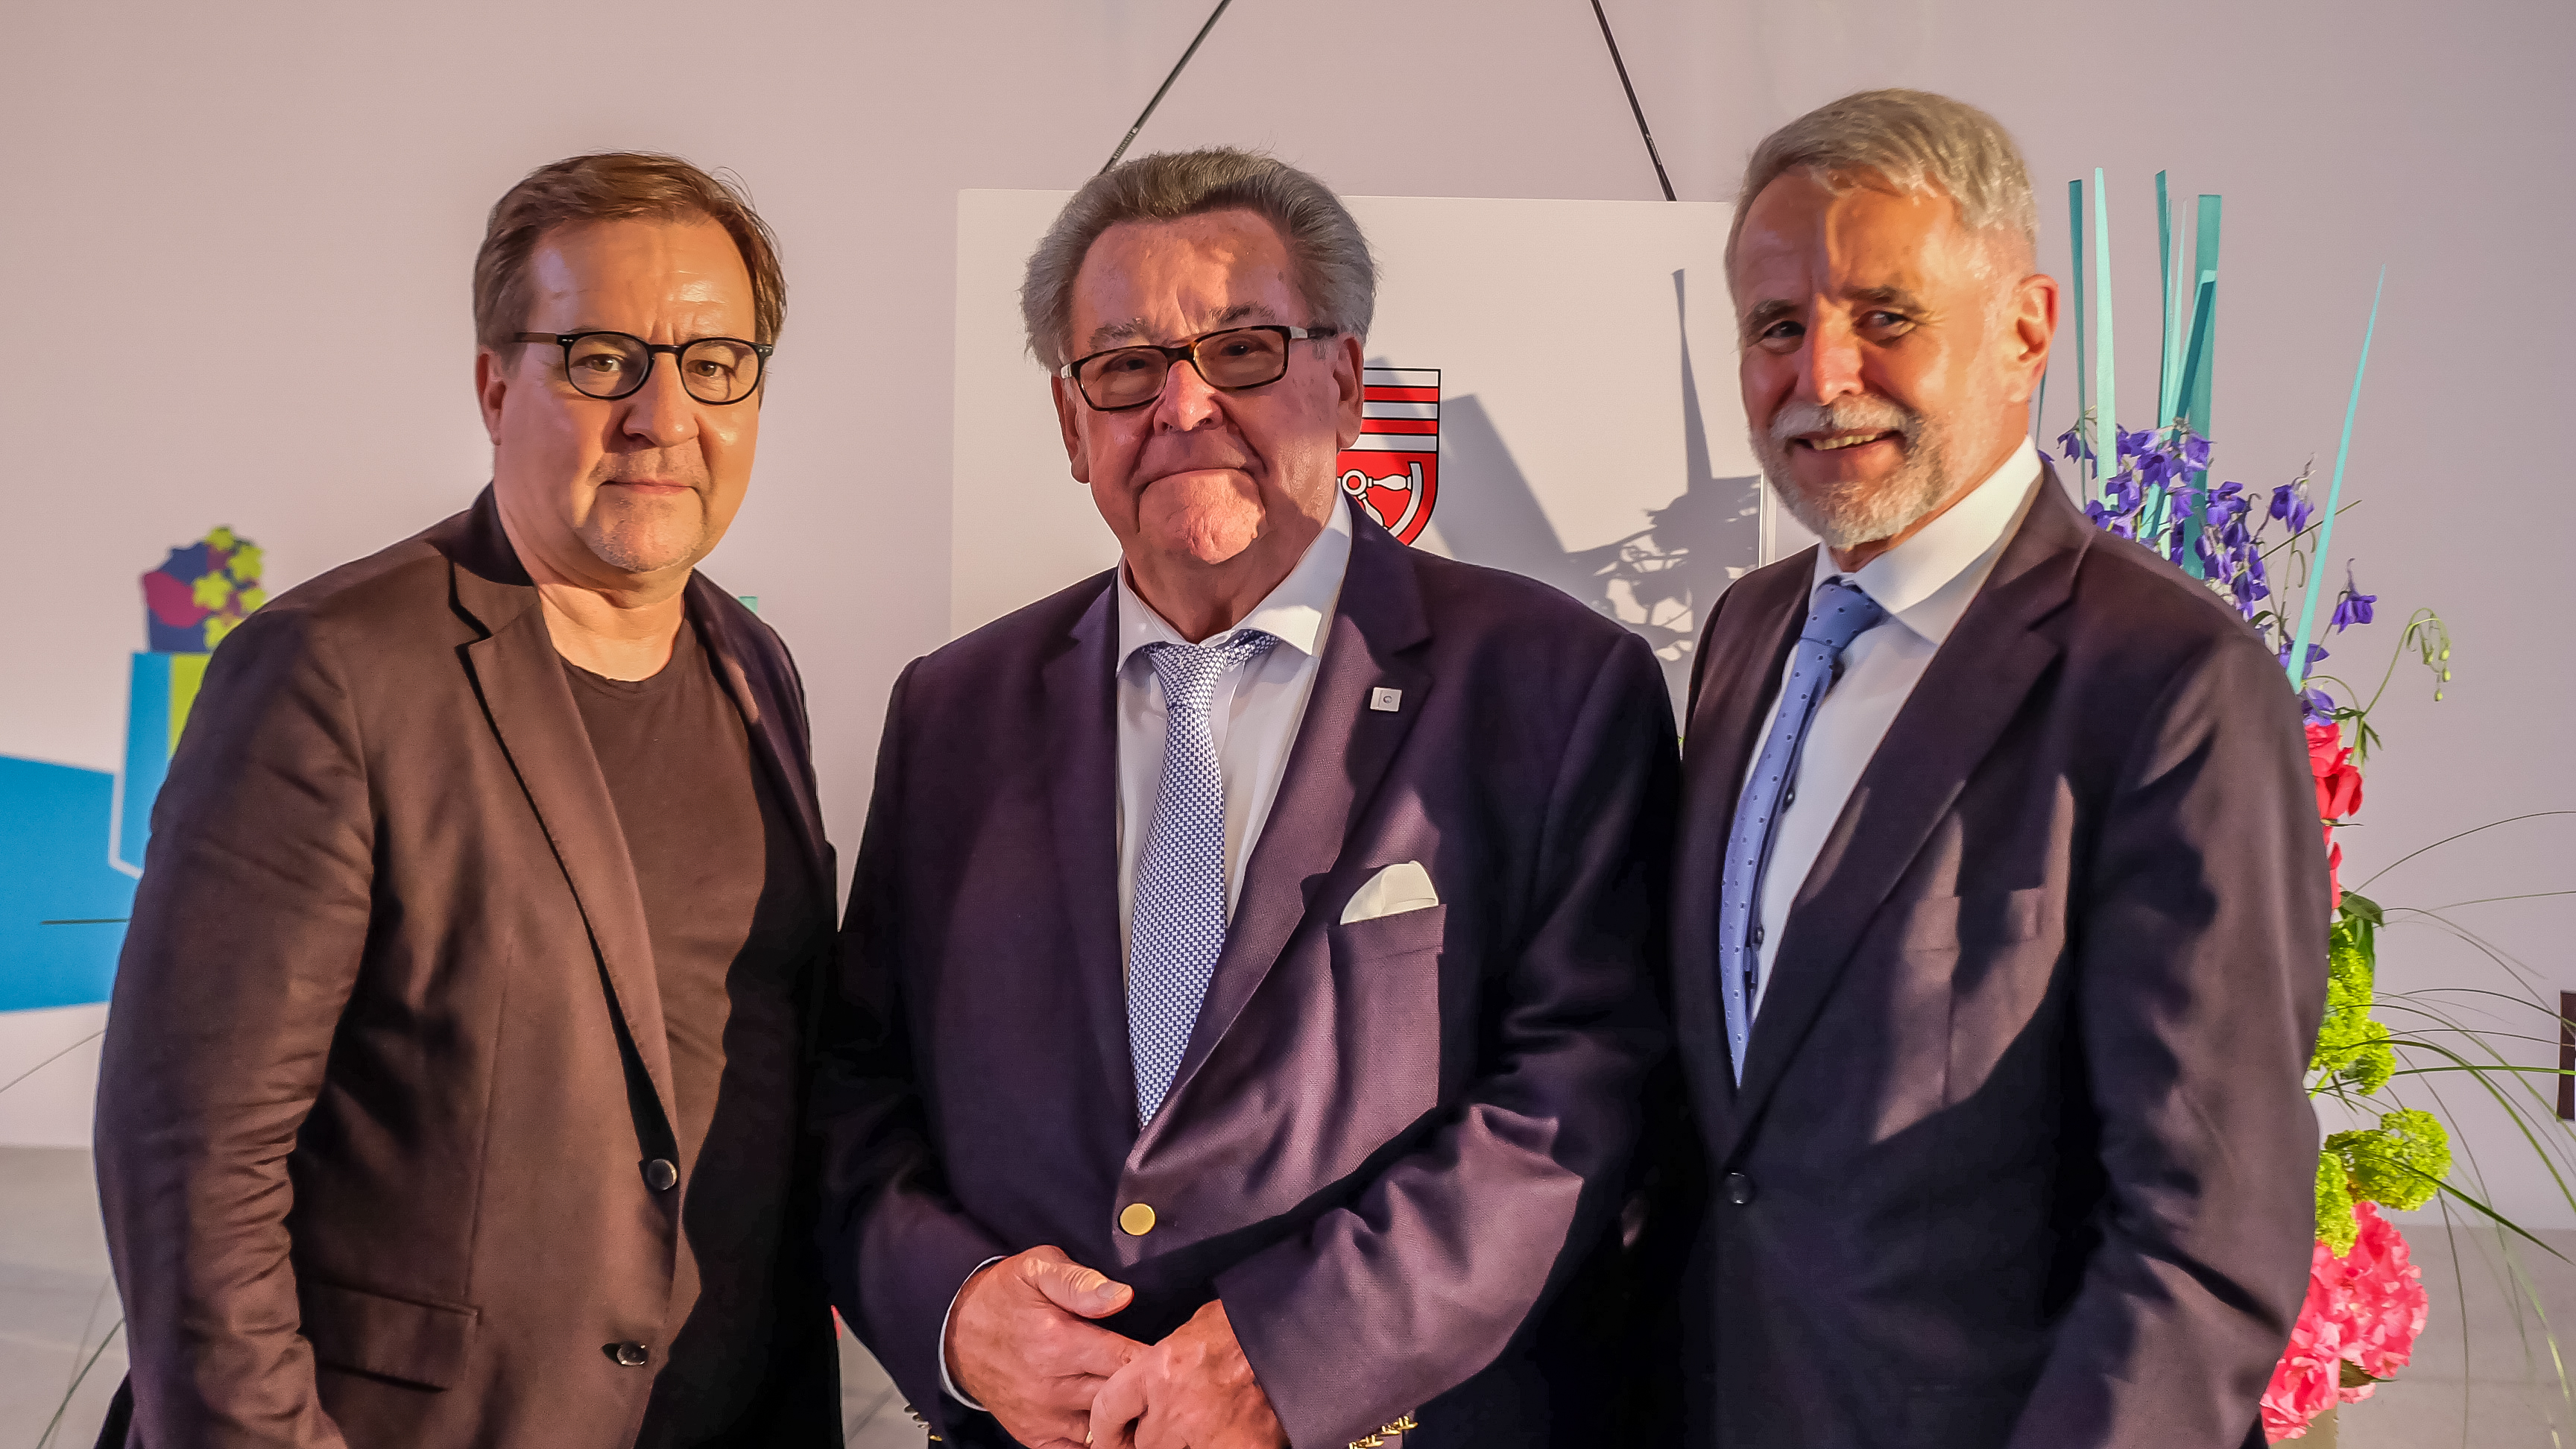 Andreas Gaul mit P. Eckes Zornheim